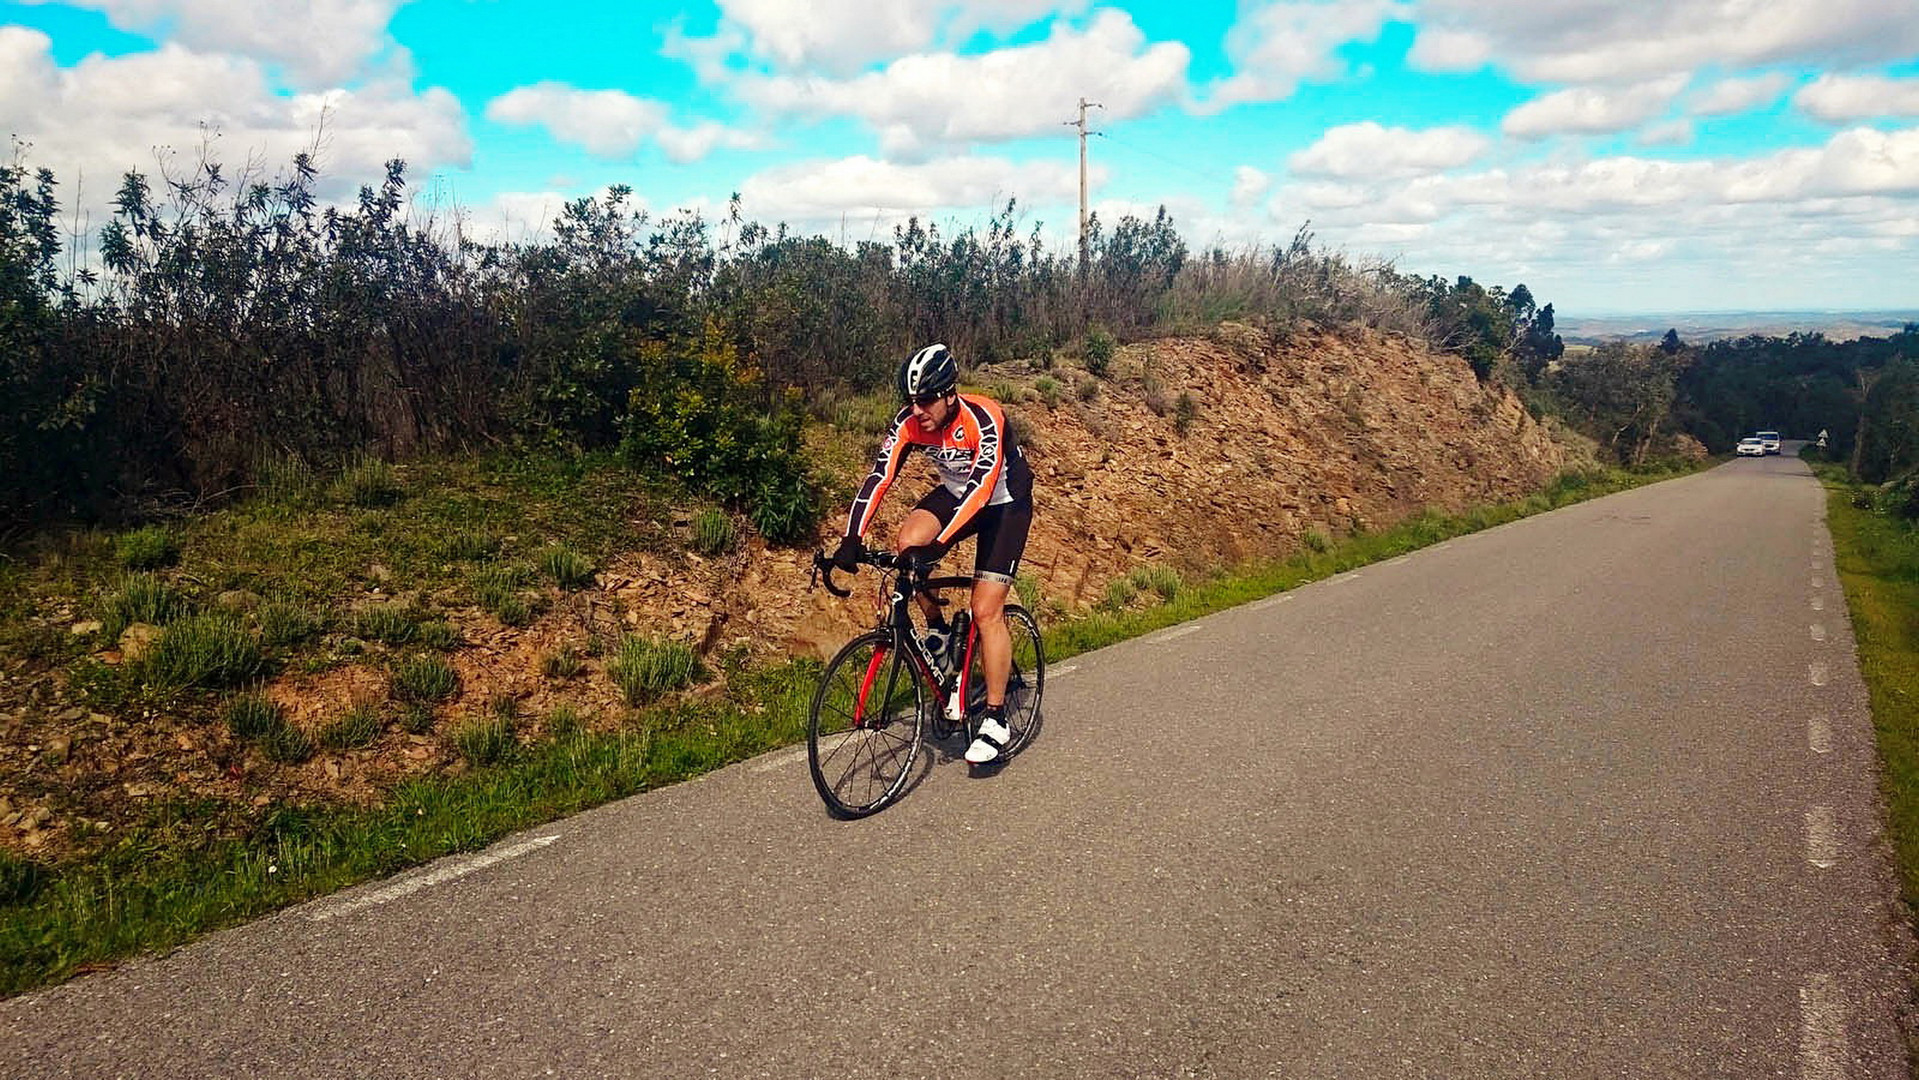 bike-tours-algarve-arrabida_6.jpg